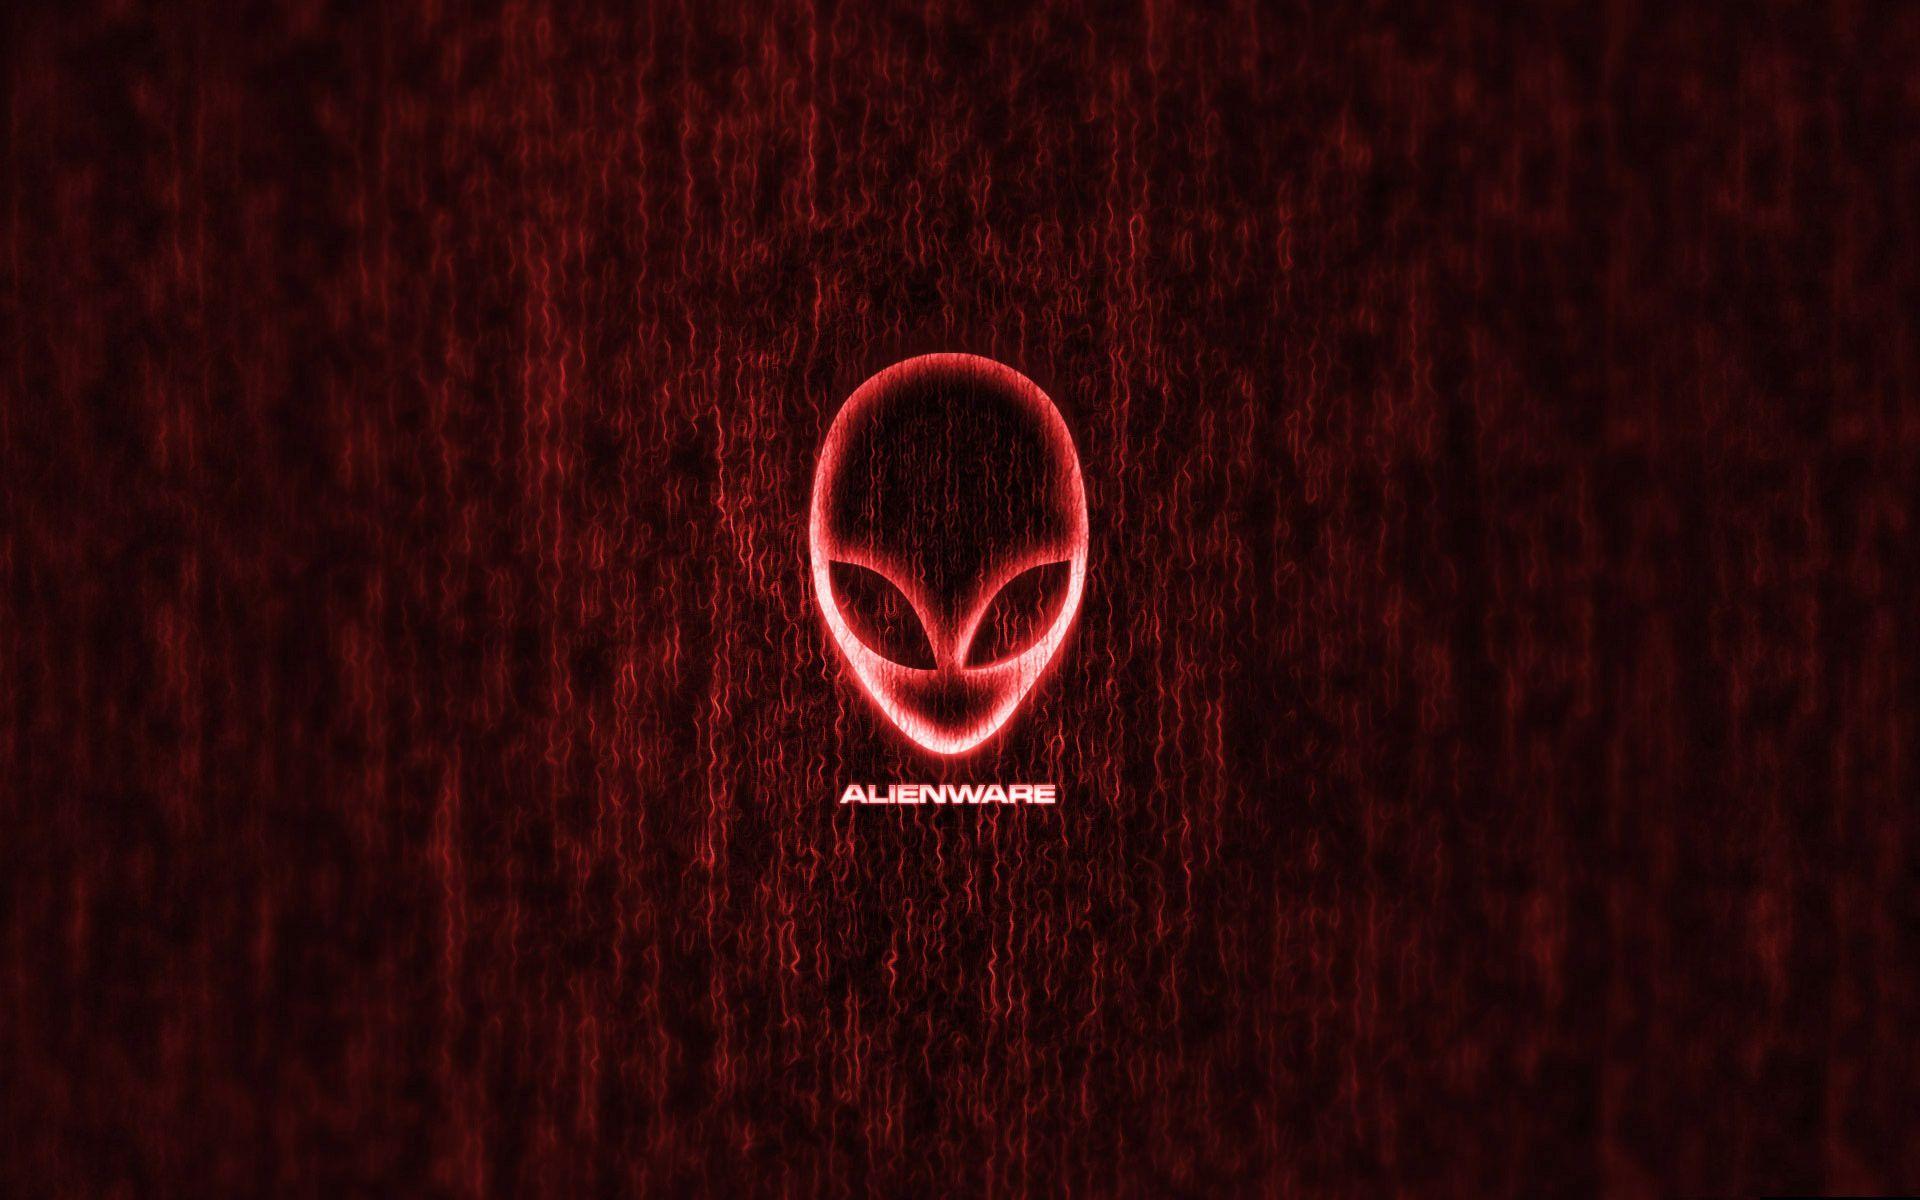 Red alienware matrix wallpaper hd pinterest alienware red alienware matrix wallpaper hd voltagebd Choice Image